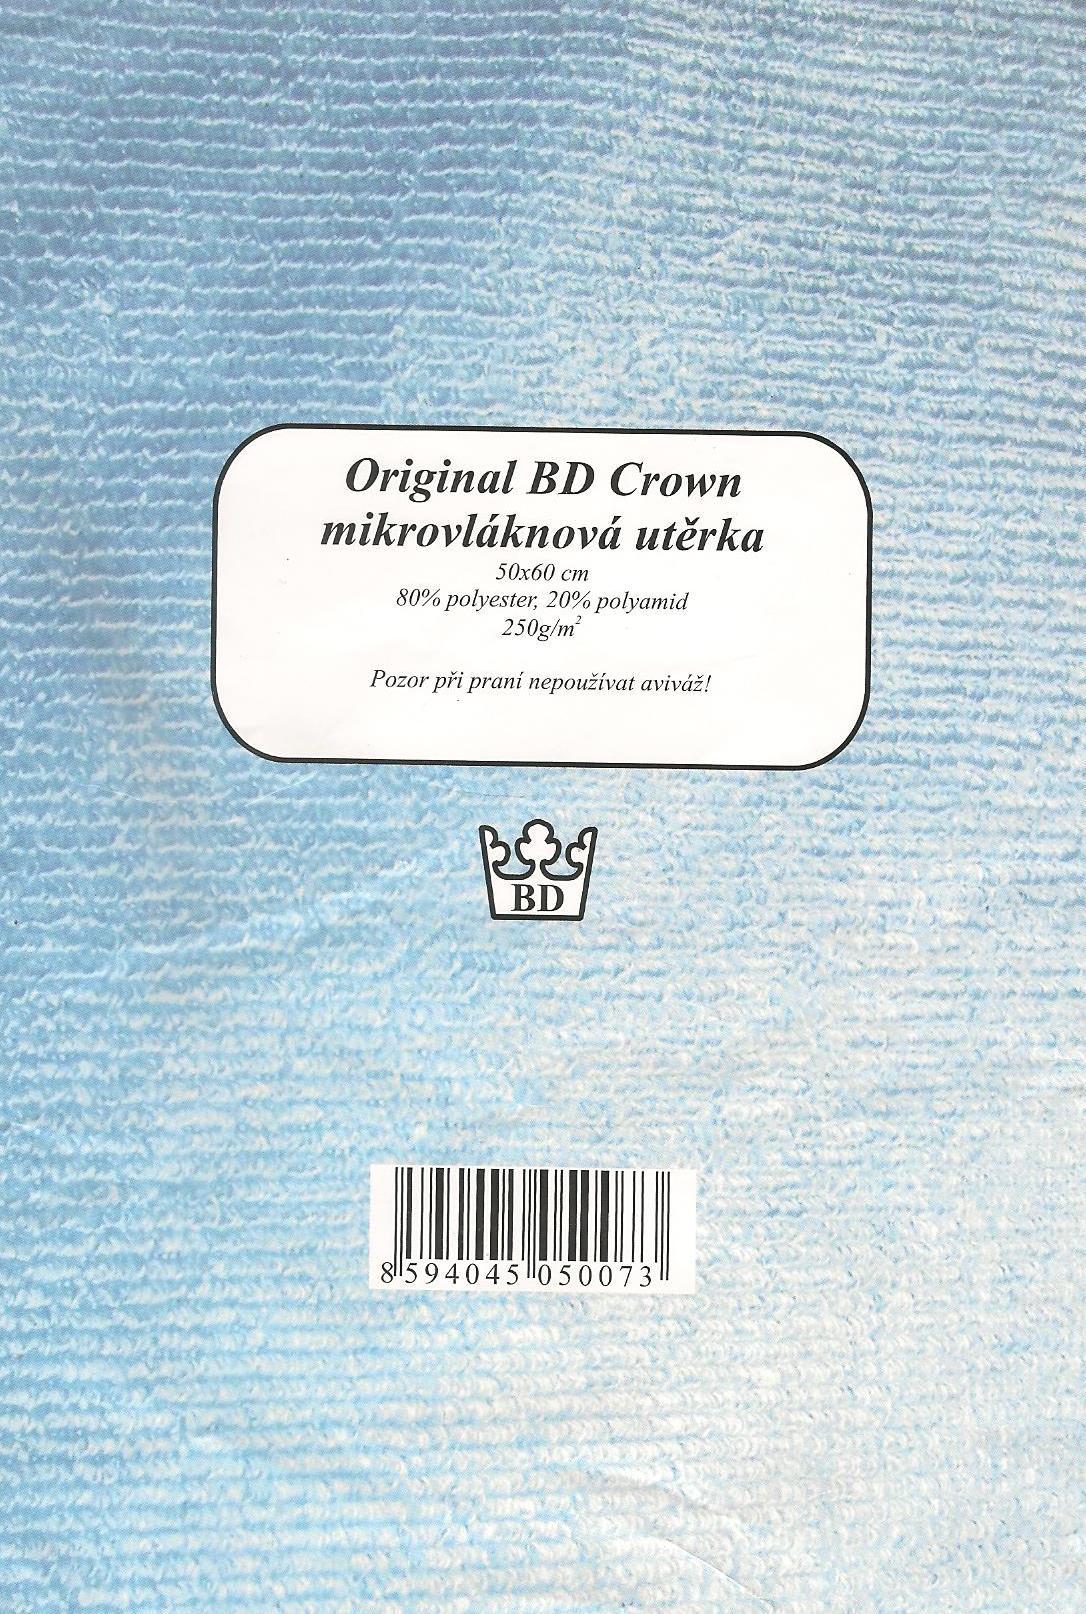 Fotografie Original BD Crown mikrovláknová utěrka 50 x 60 cm